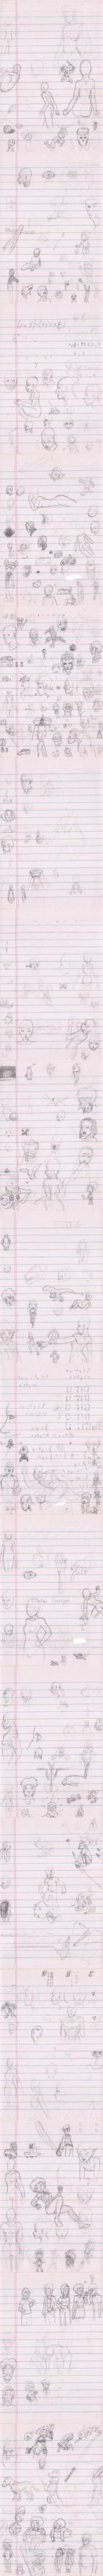 Doodle Dump (December 2014, II) by Zcmrrd